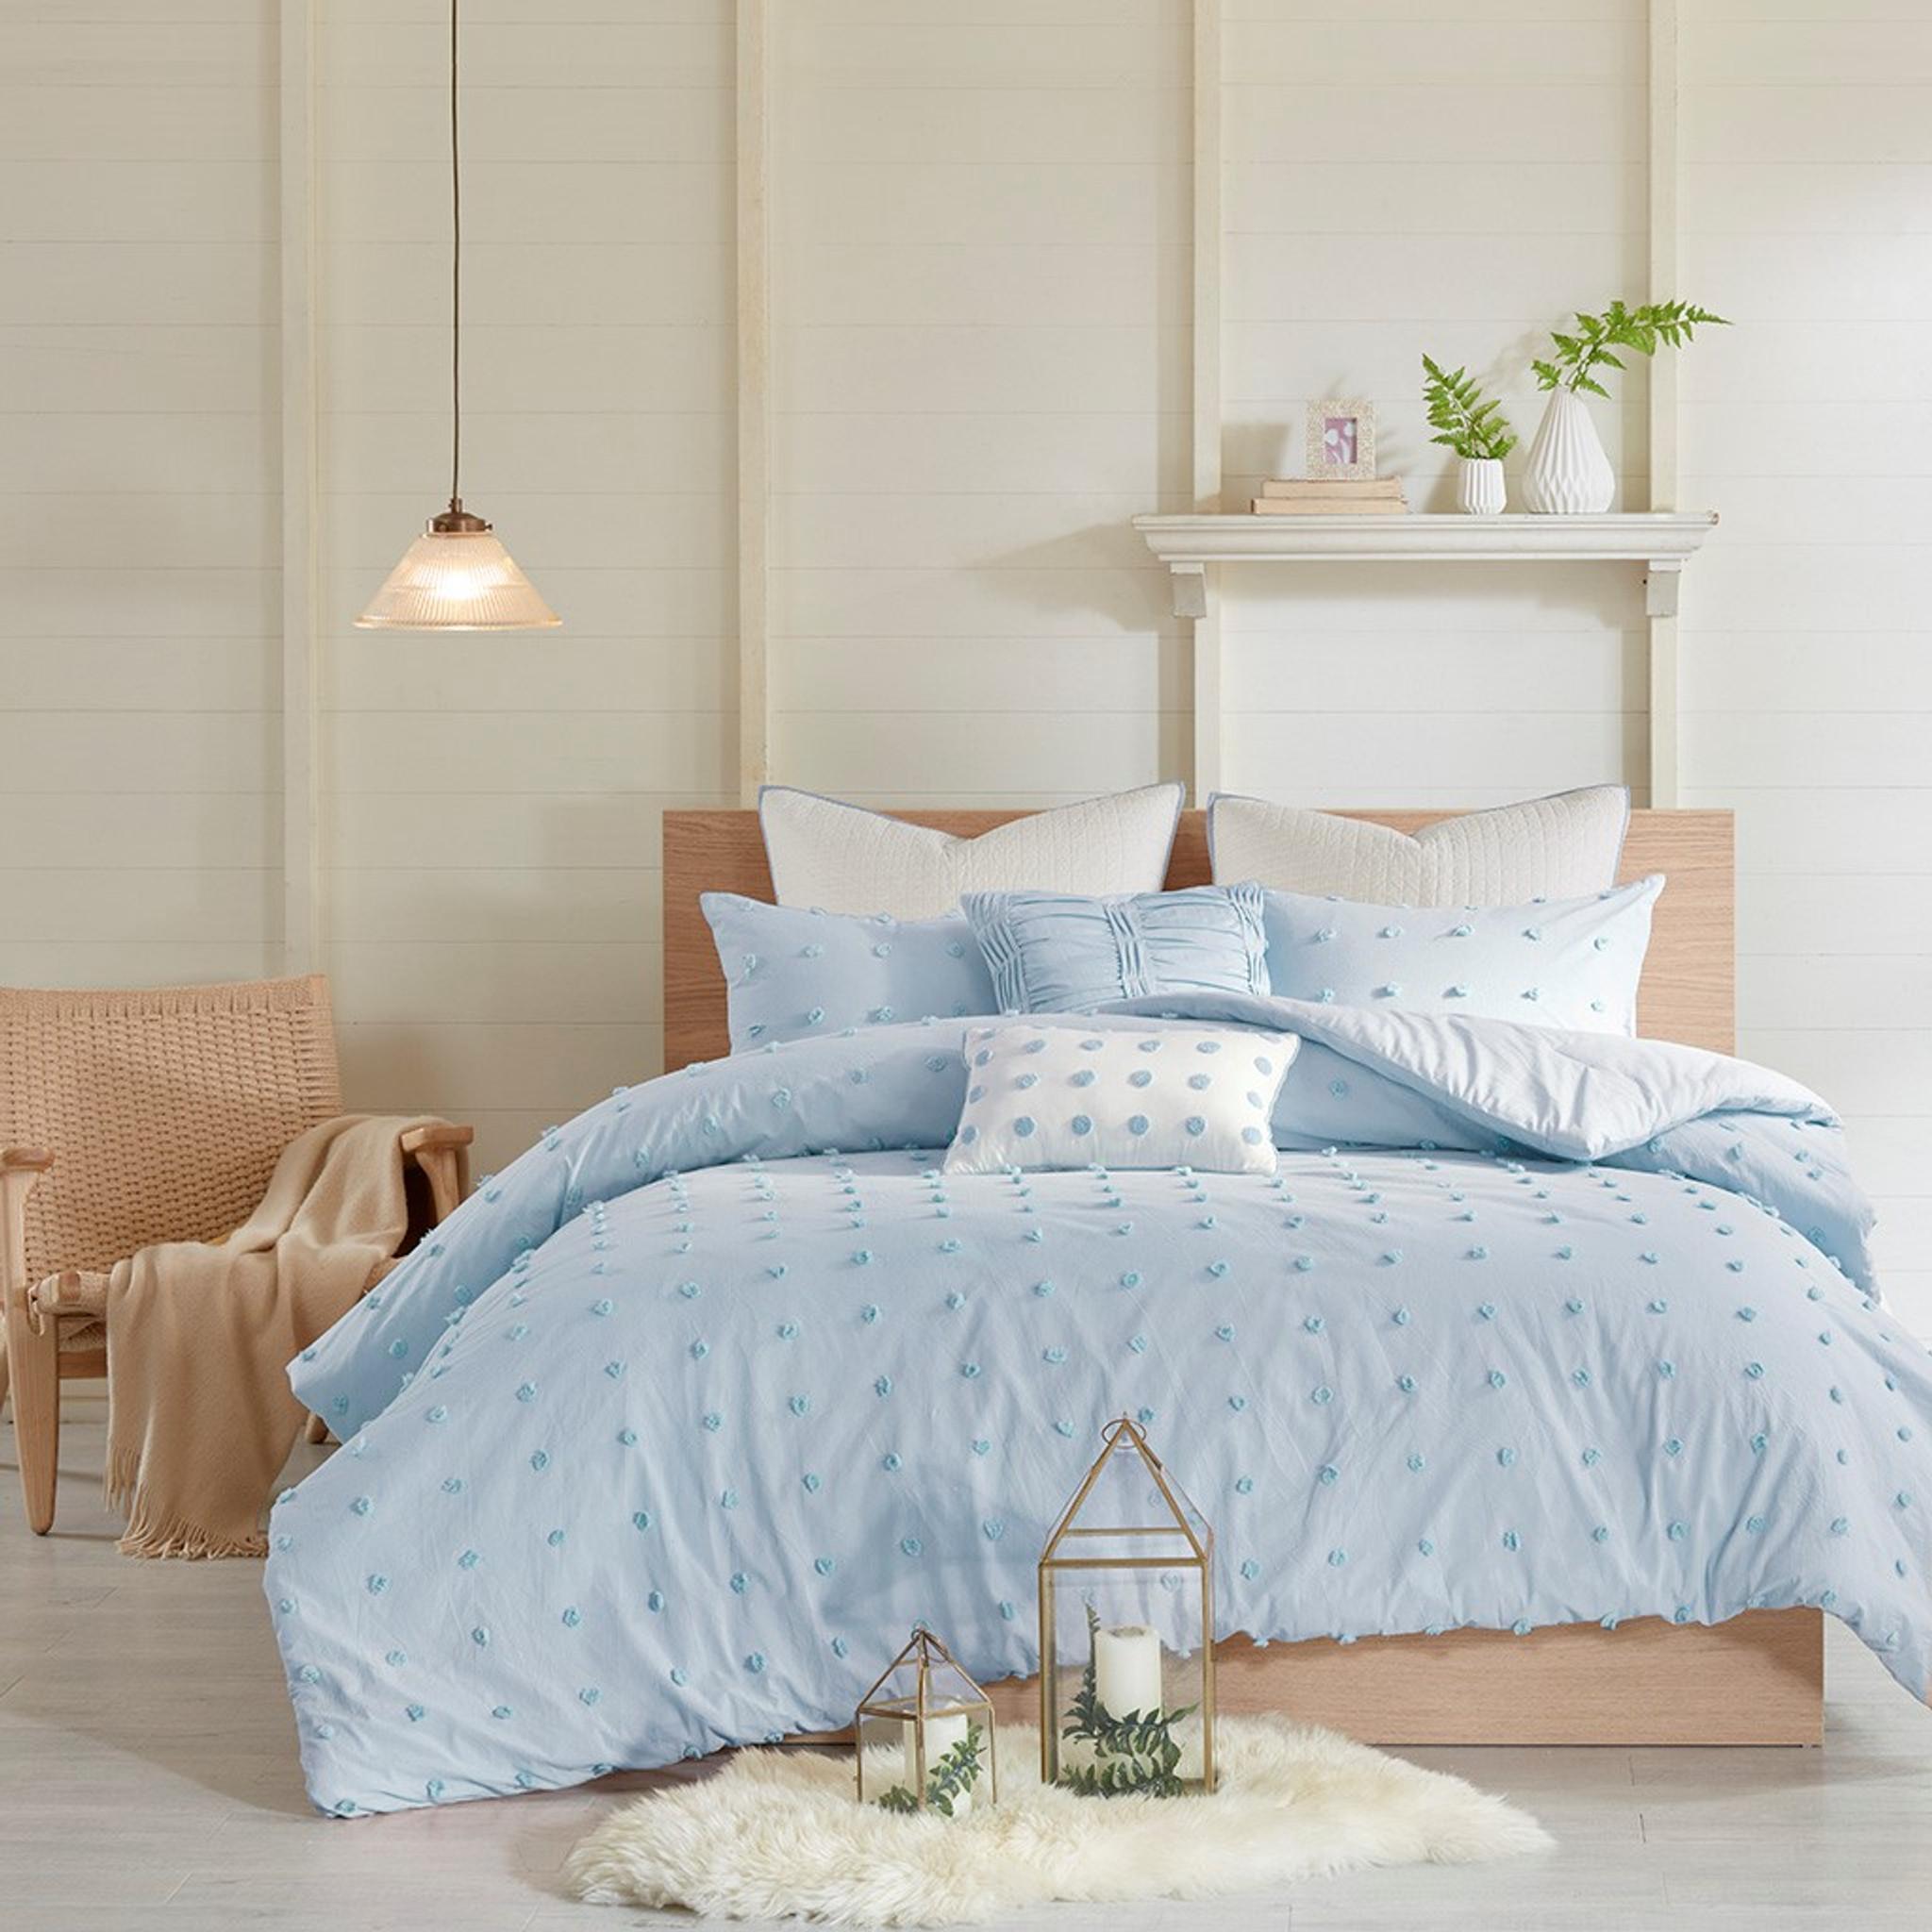 Rockaway Beach Light Blue Queen Comforter Set